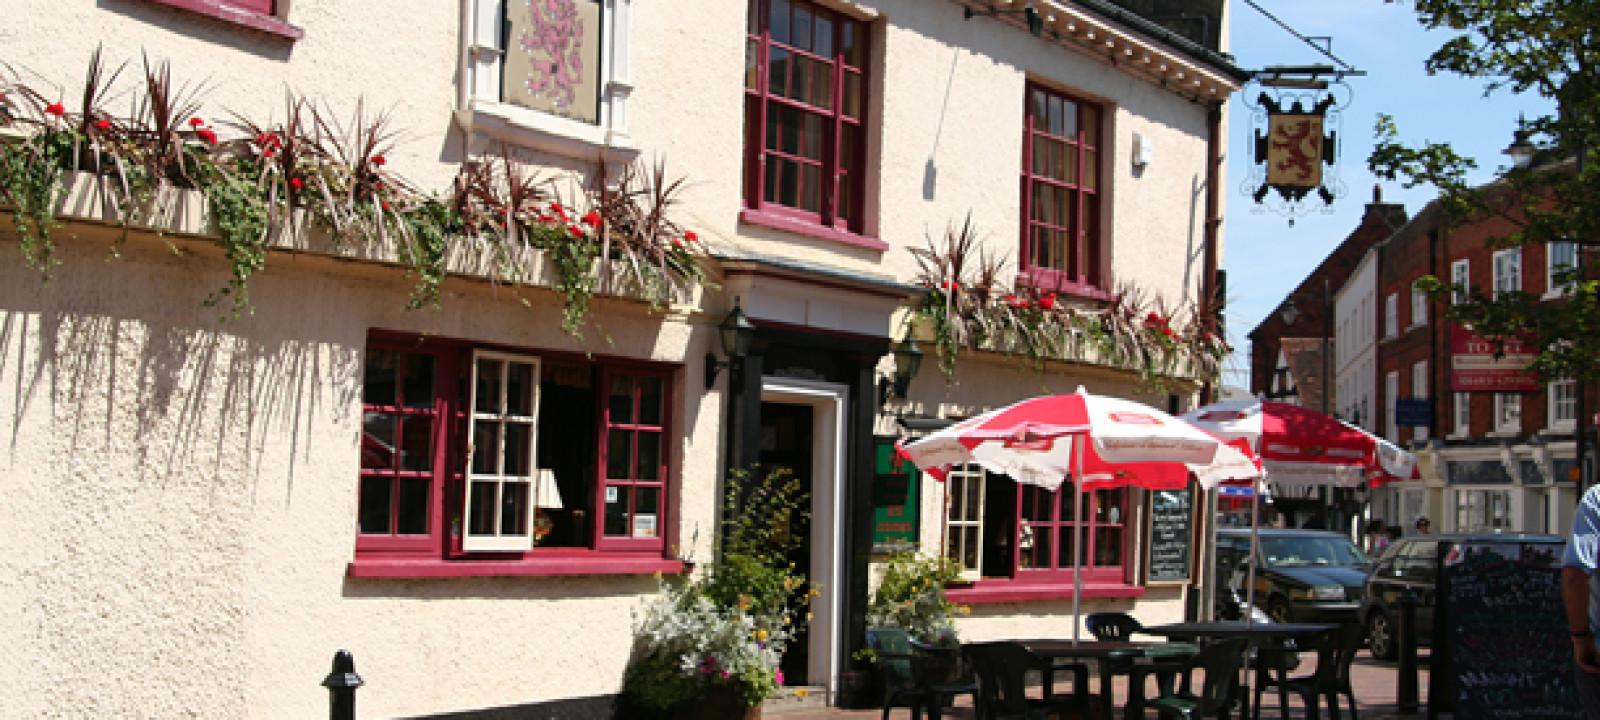 612x344_british_pub